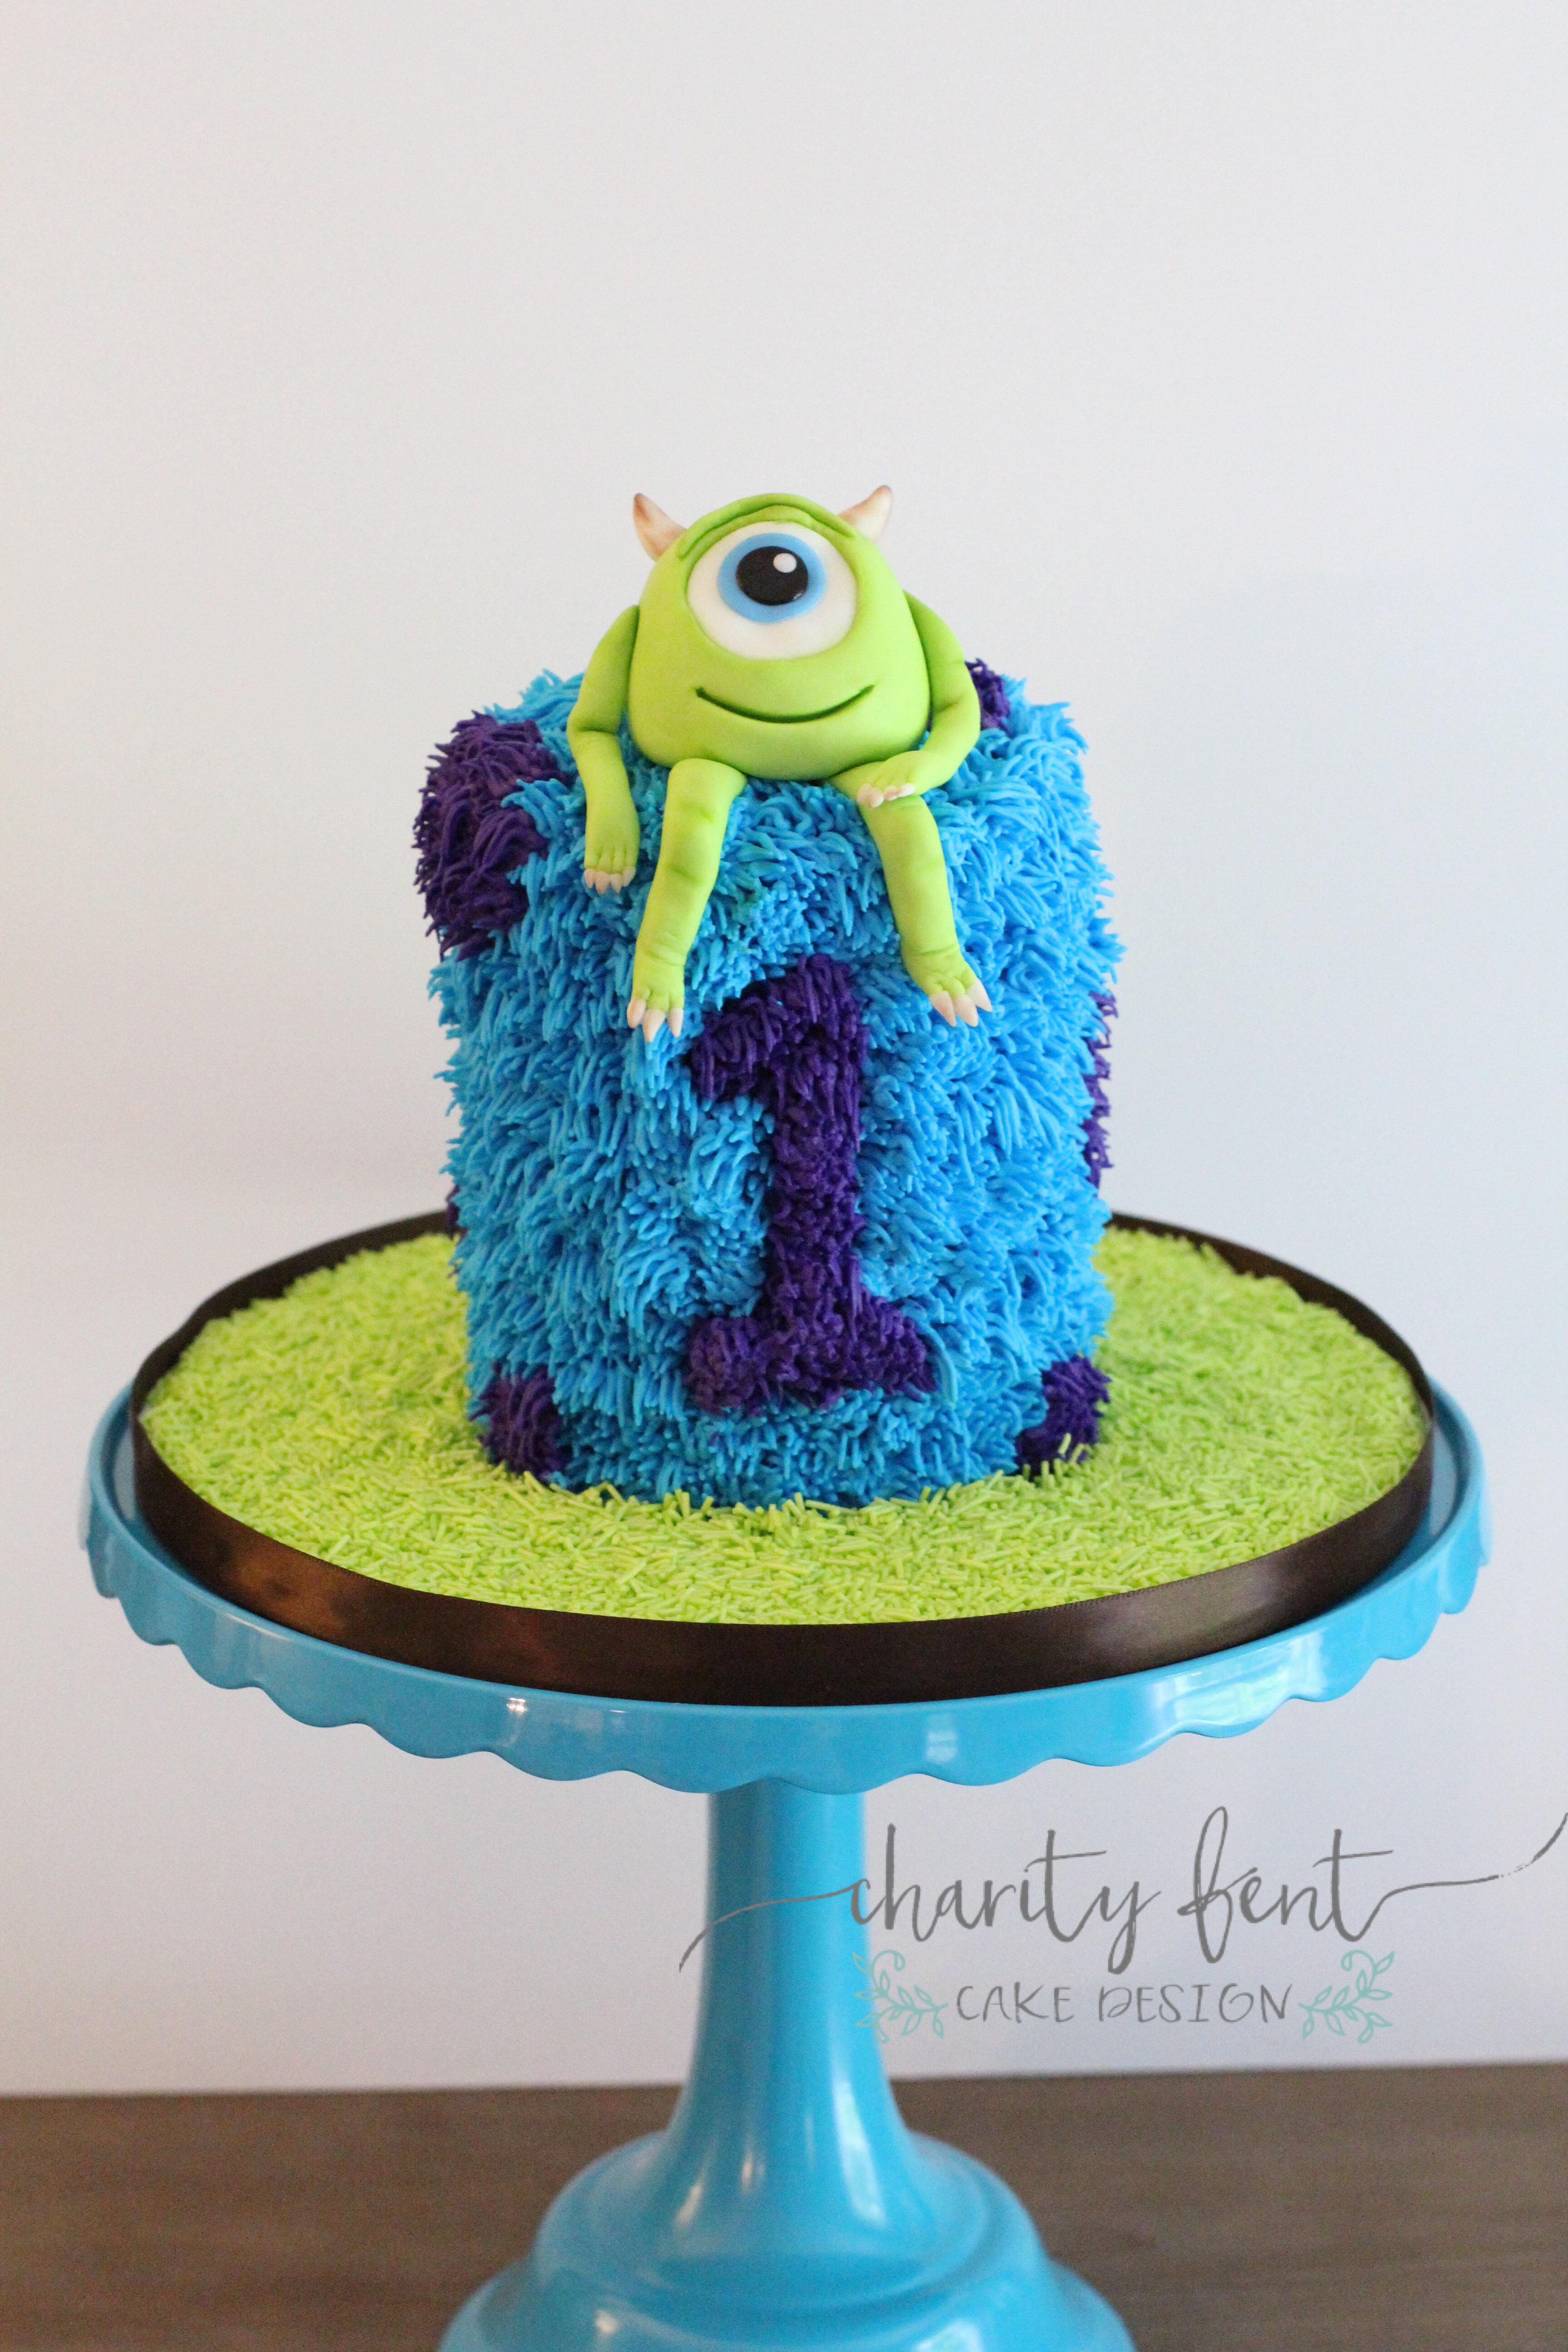 Monsters Inc 1st Birthday Charity Fent Cake Design